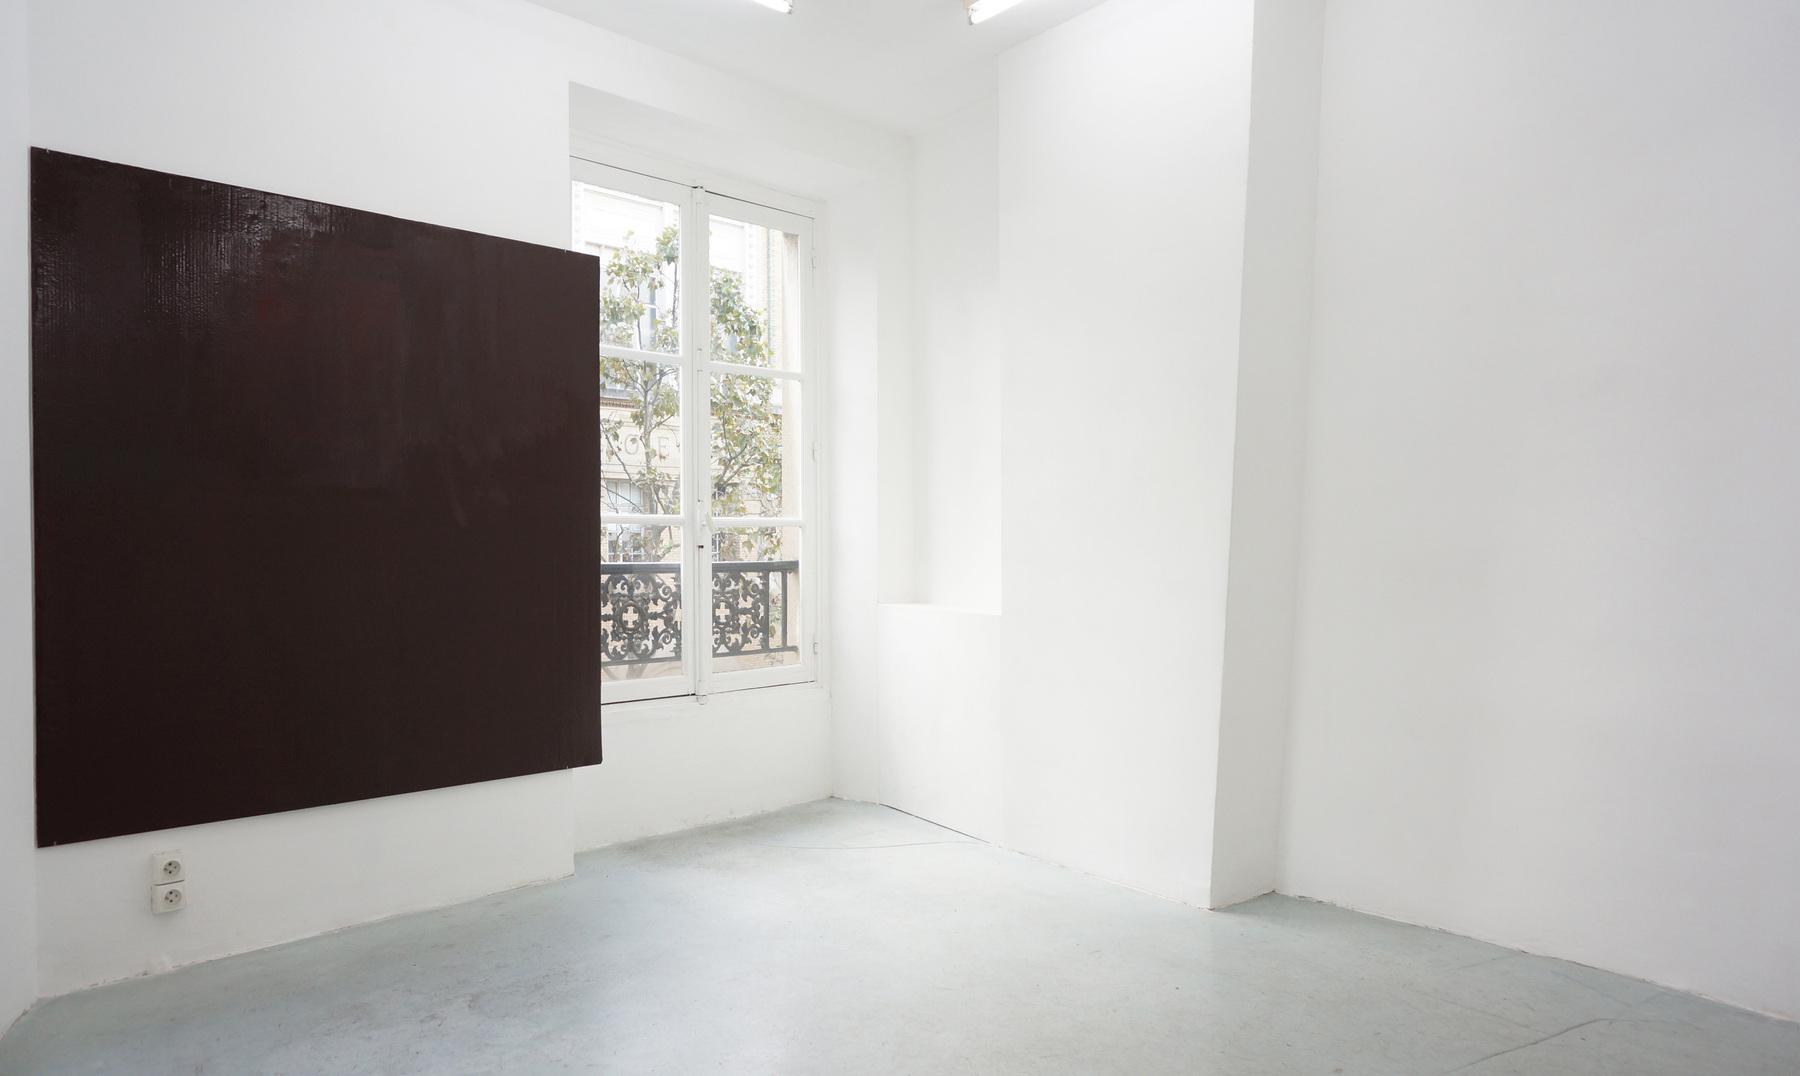 Galerie Joseph Tang _Alexander Lieck_Oci Ciornie_2015_06